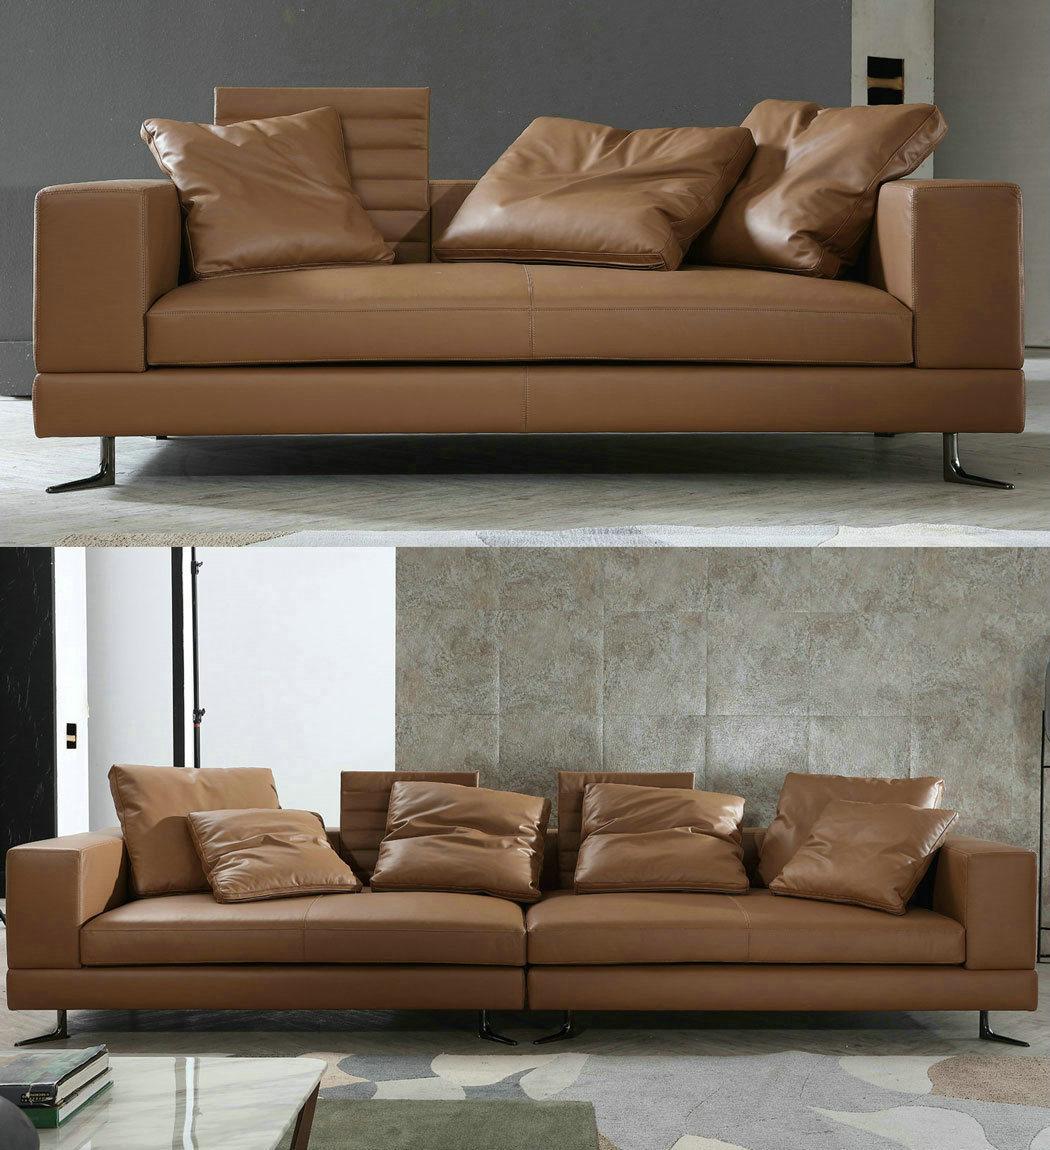 Living Room Furniture Modern Design Fabric Sofa (T1806)